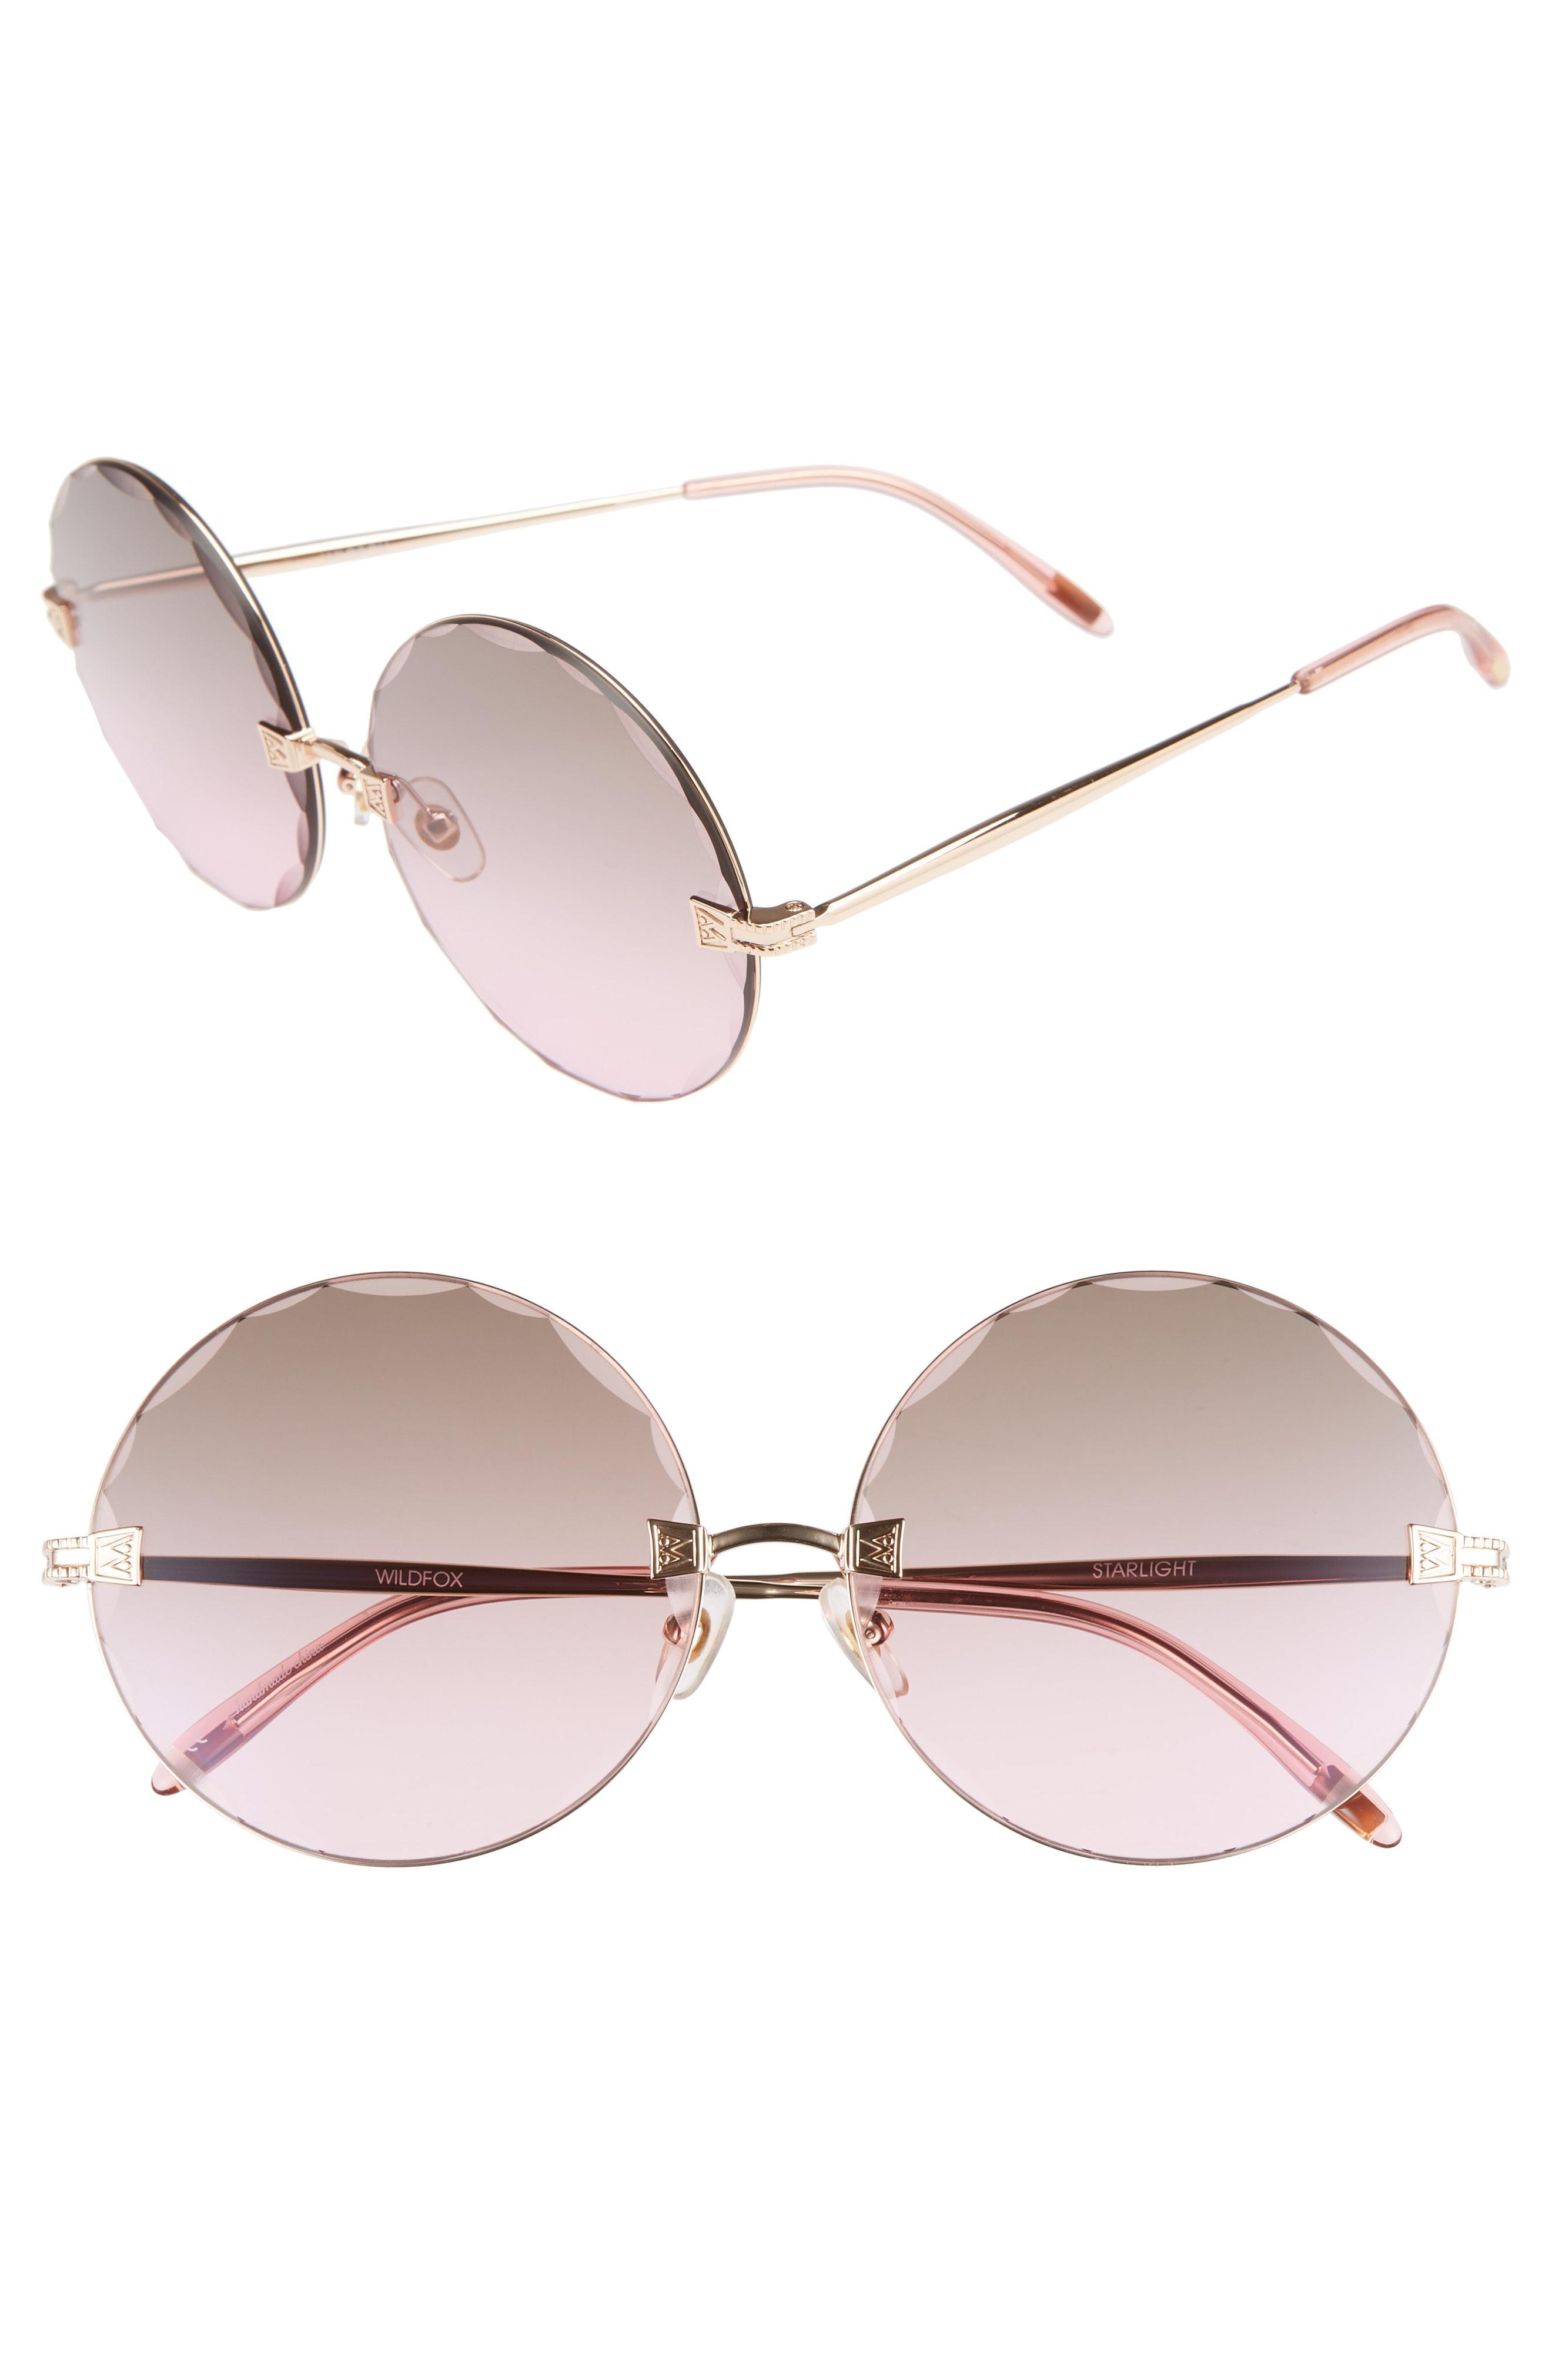 Wildfox Starlight 62mm Oversize Round Sunglasses